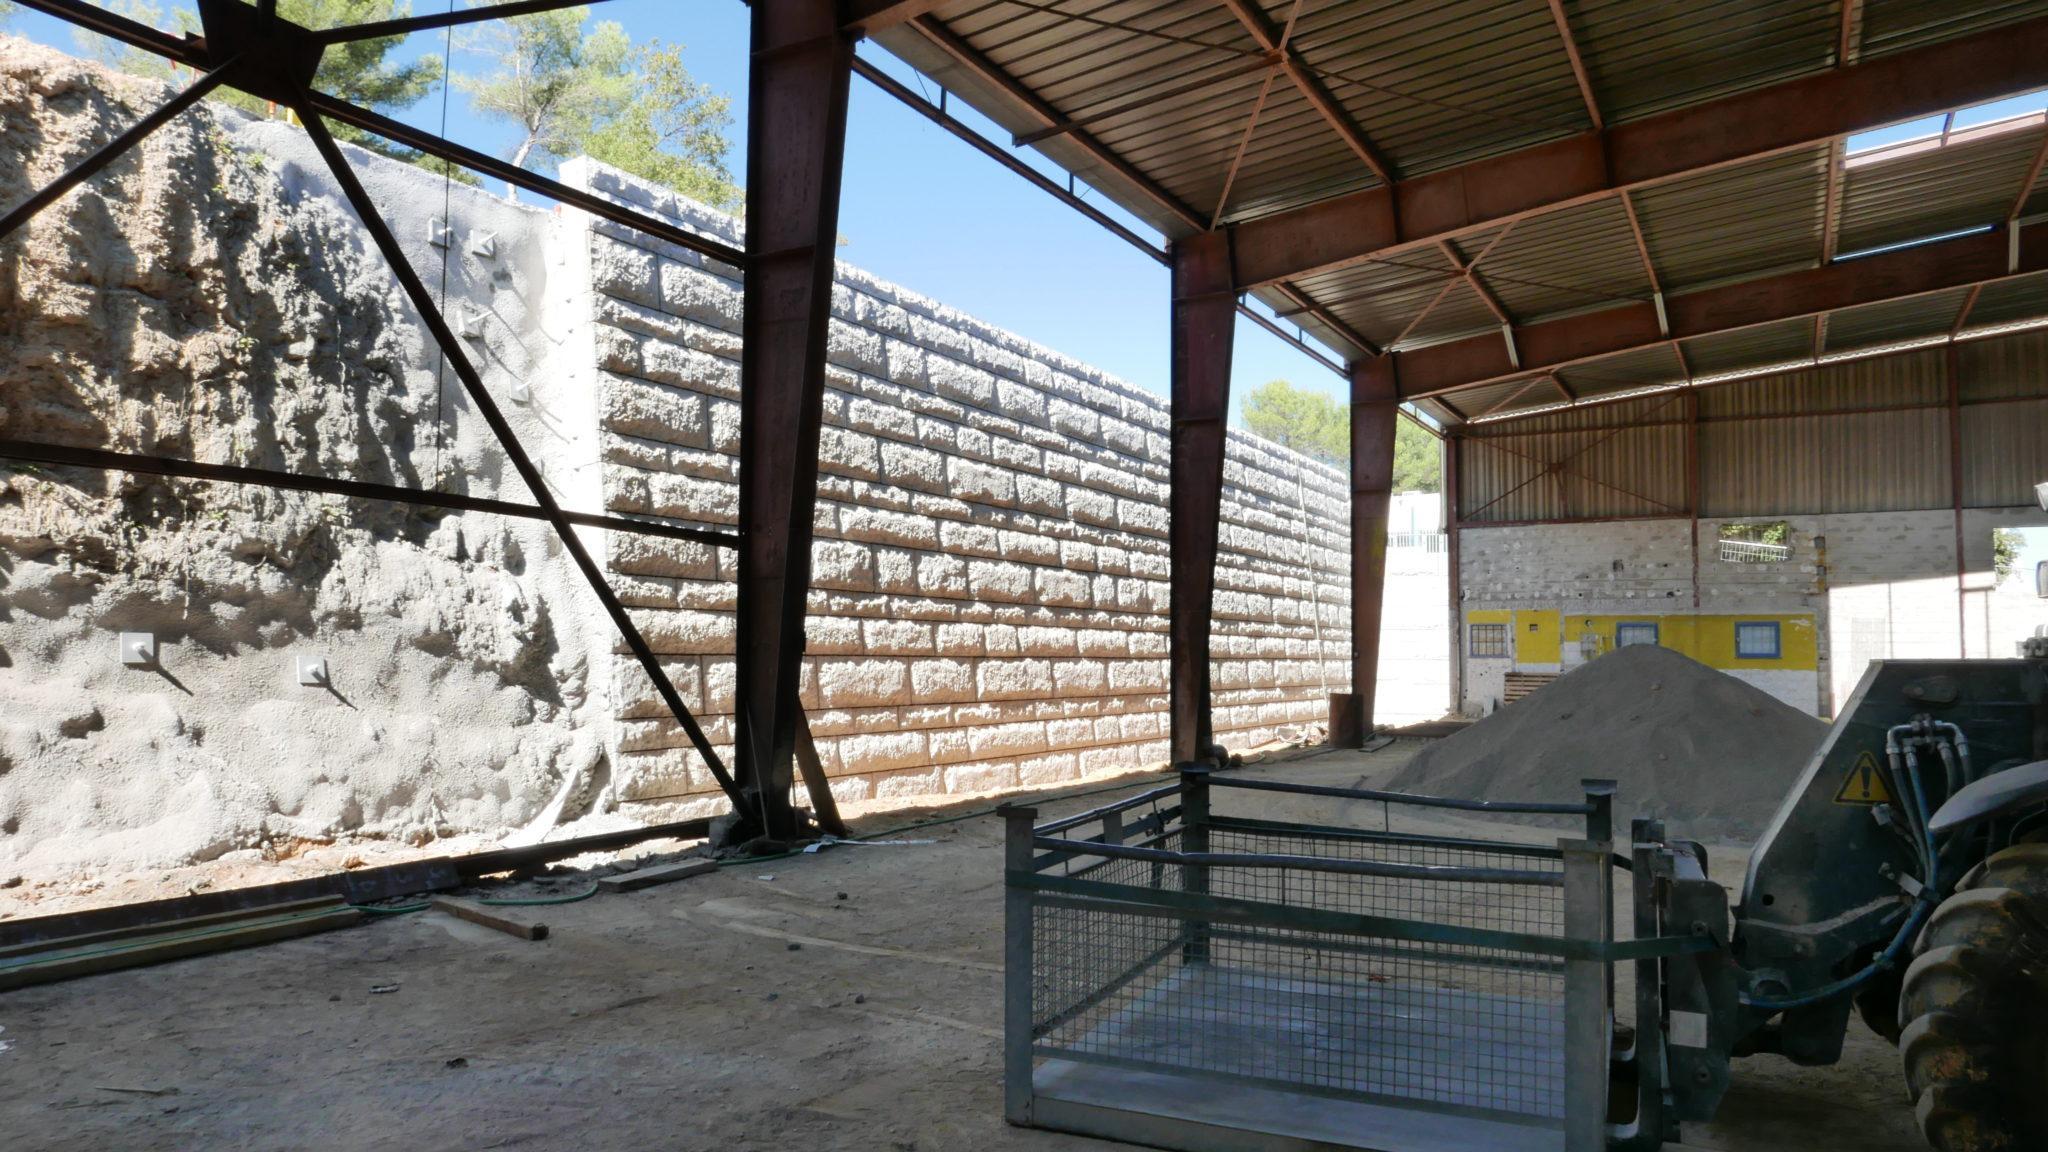 chantier Cananzi les bastides